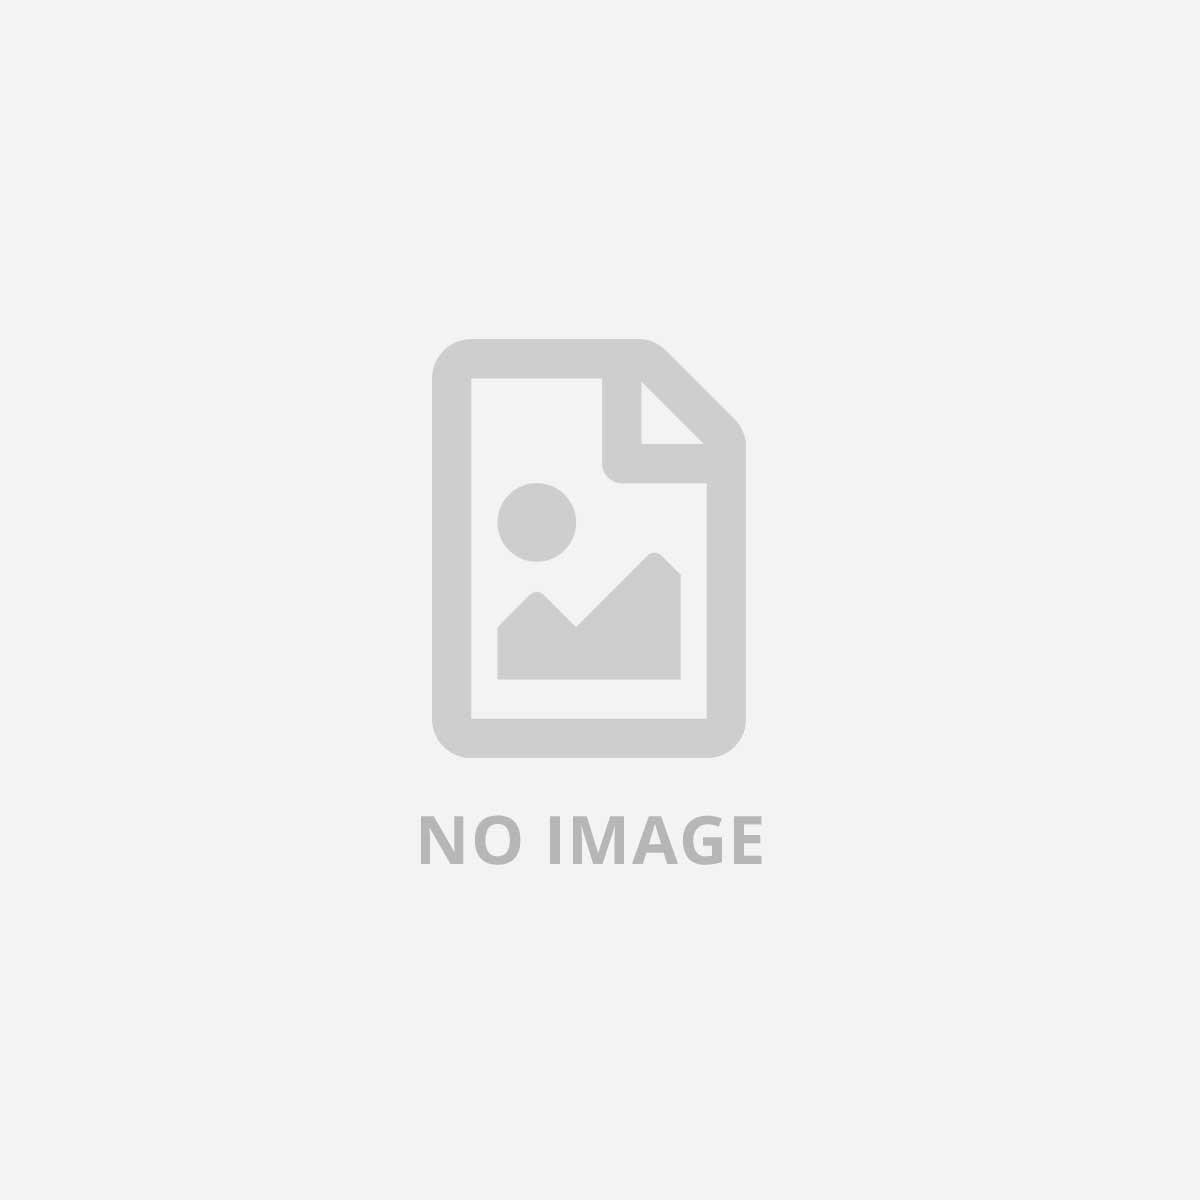 IBM 10GB 2-PORT BASE-T LOM